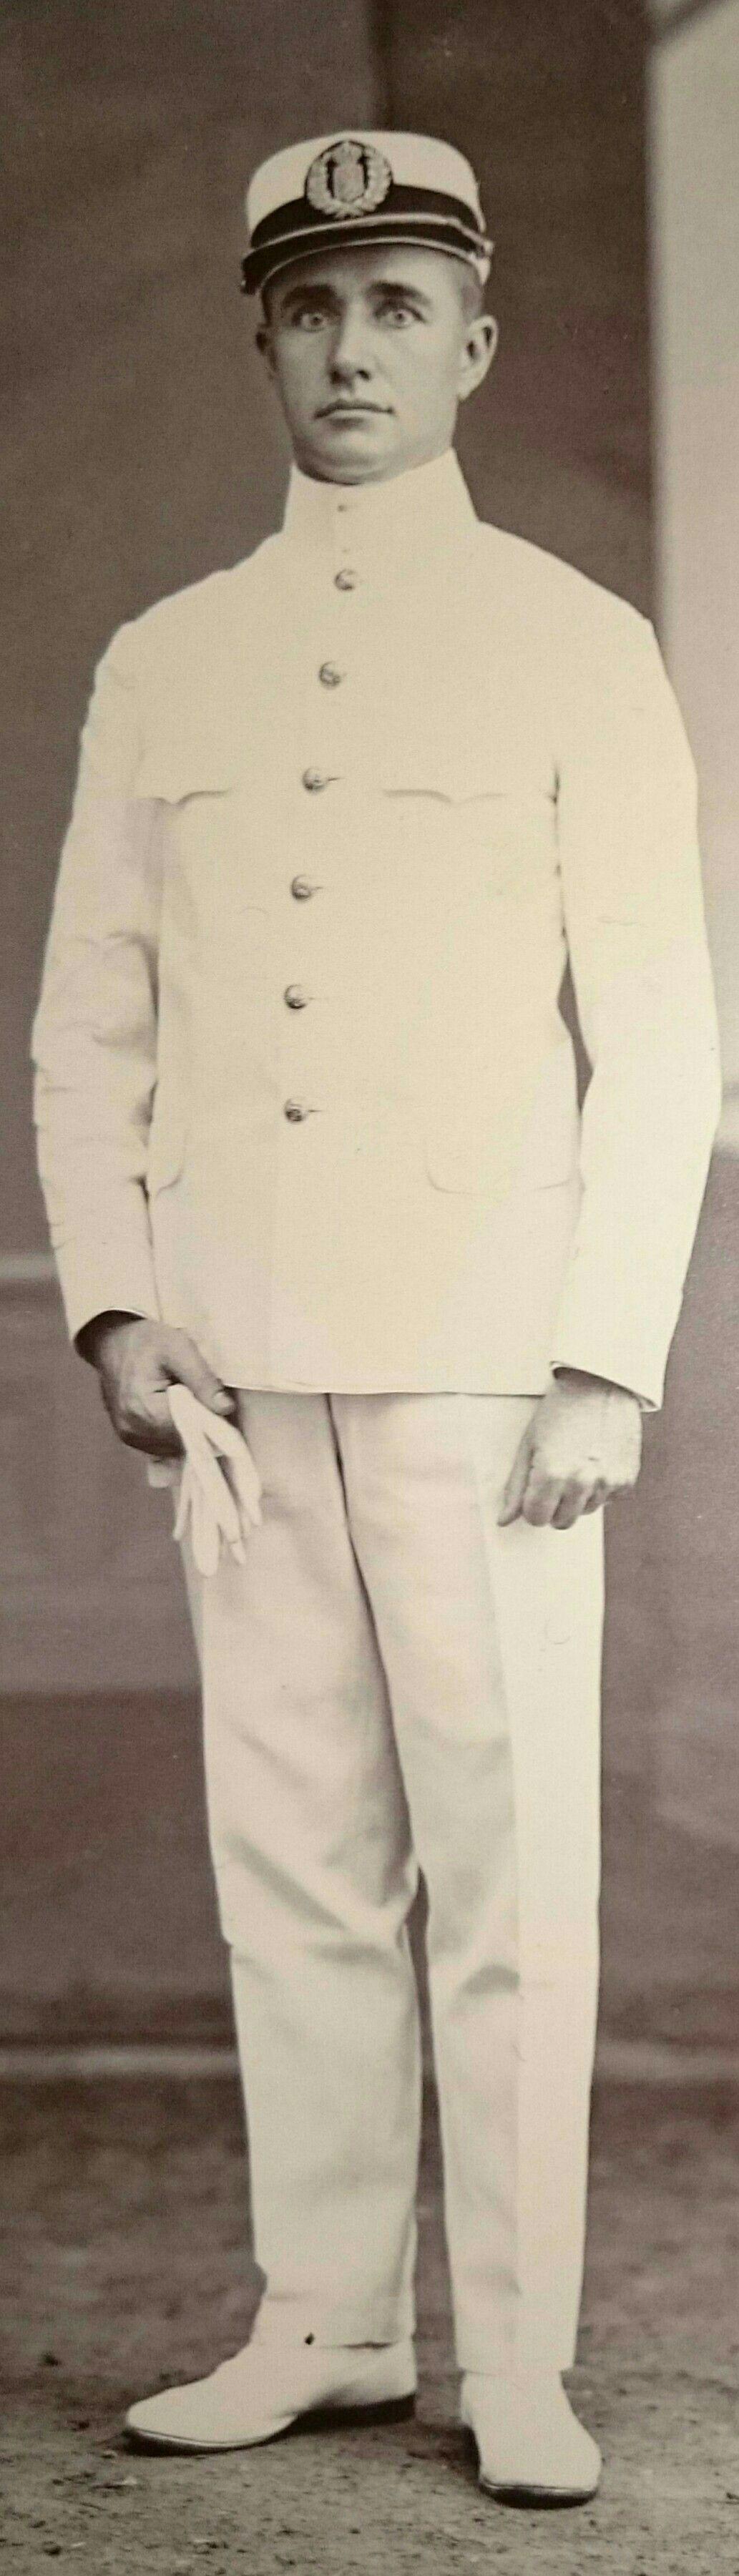 Dhr. J.Grader, Netherlands Indies. Ambtenaar Binnenlandsch Bestuur (private collection).